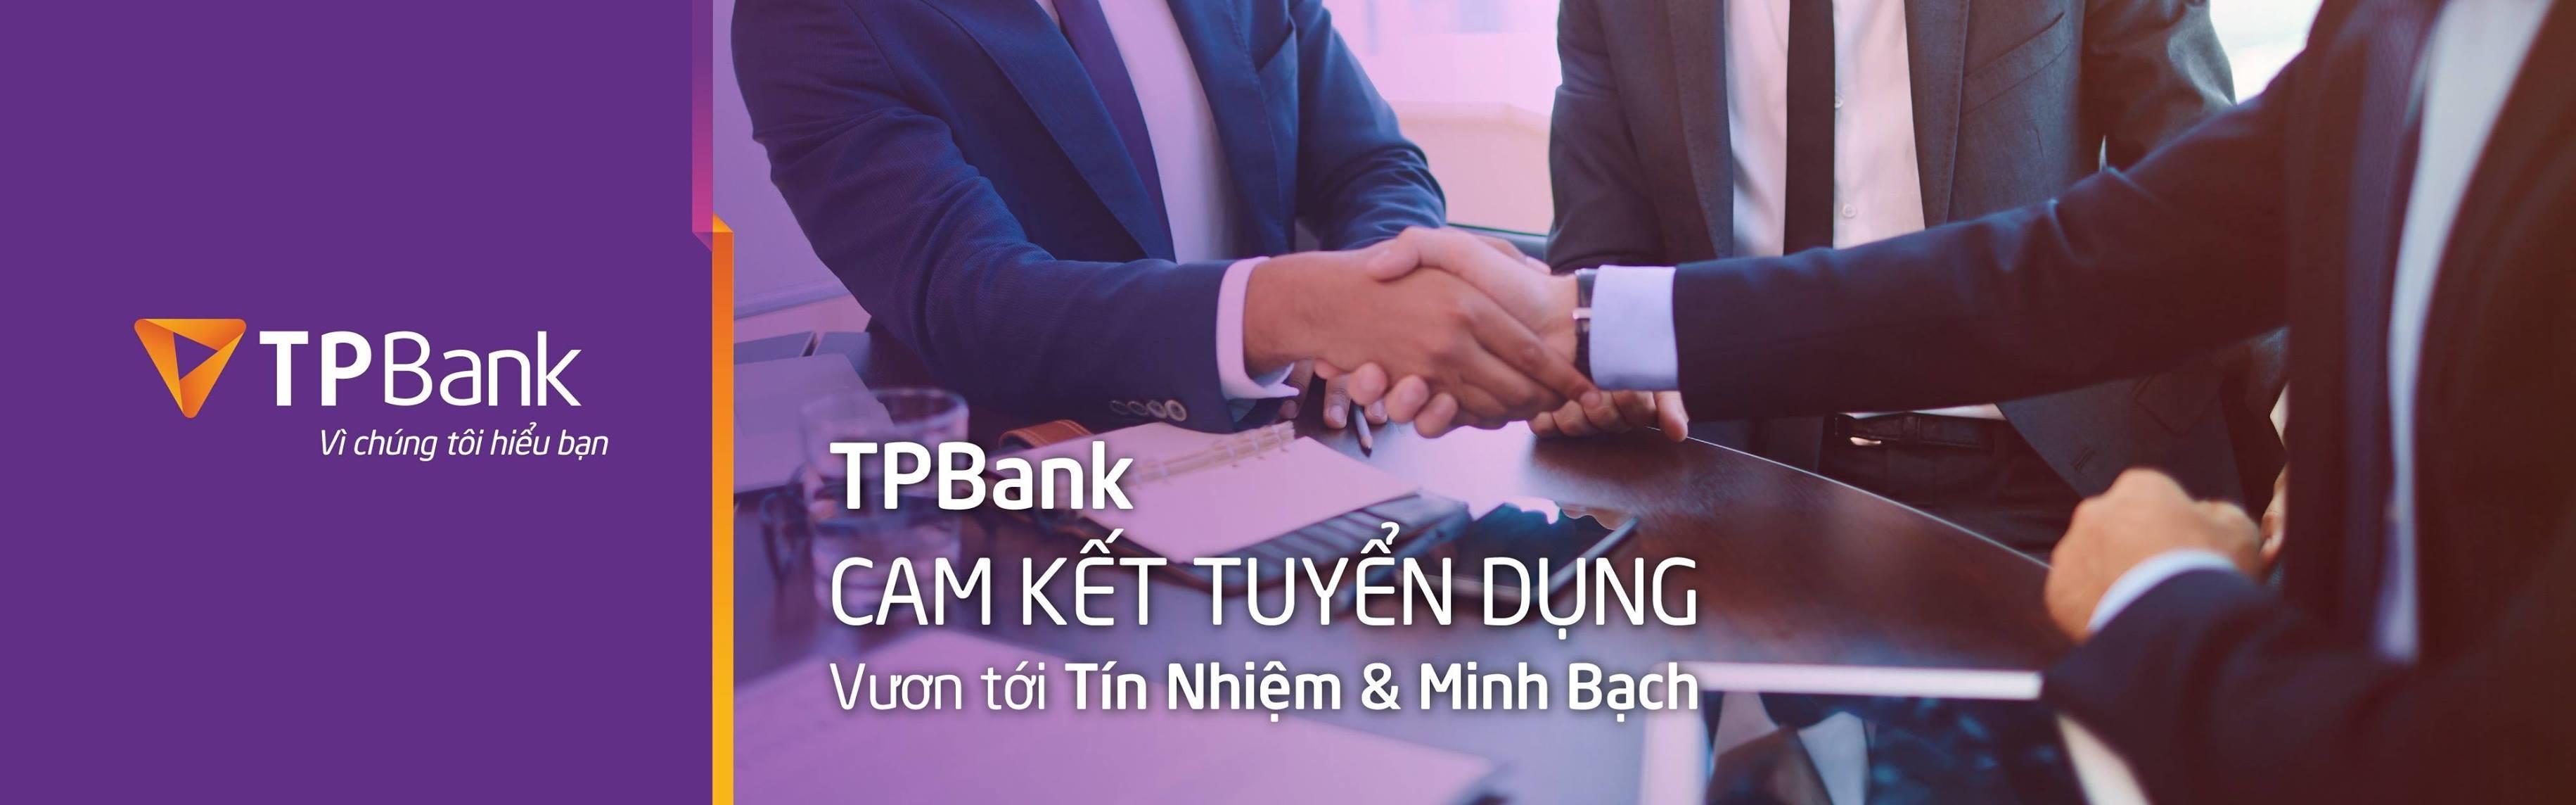 tpbank-tuyen-dung